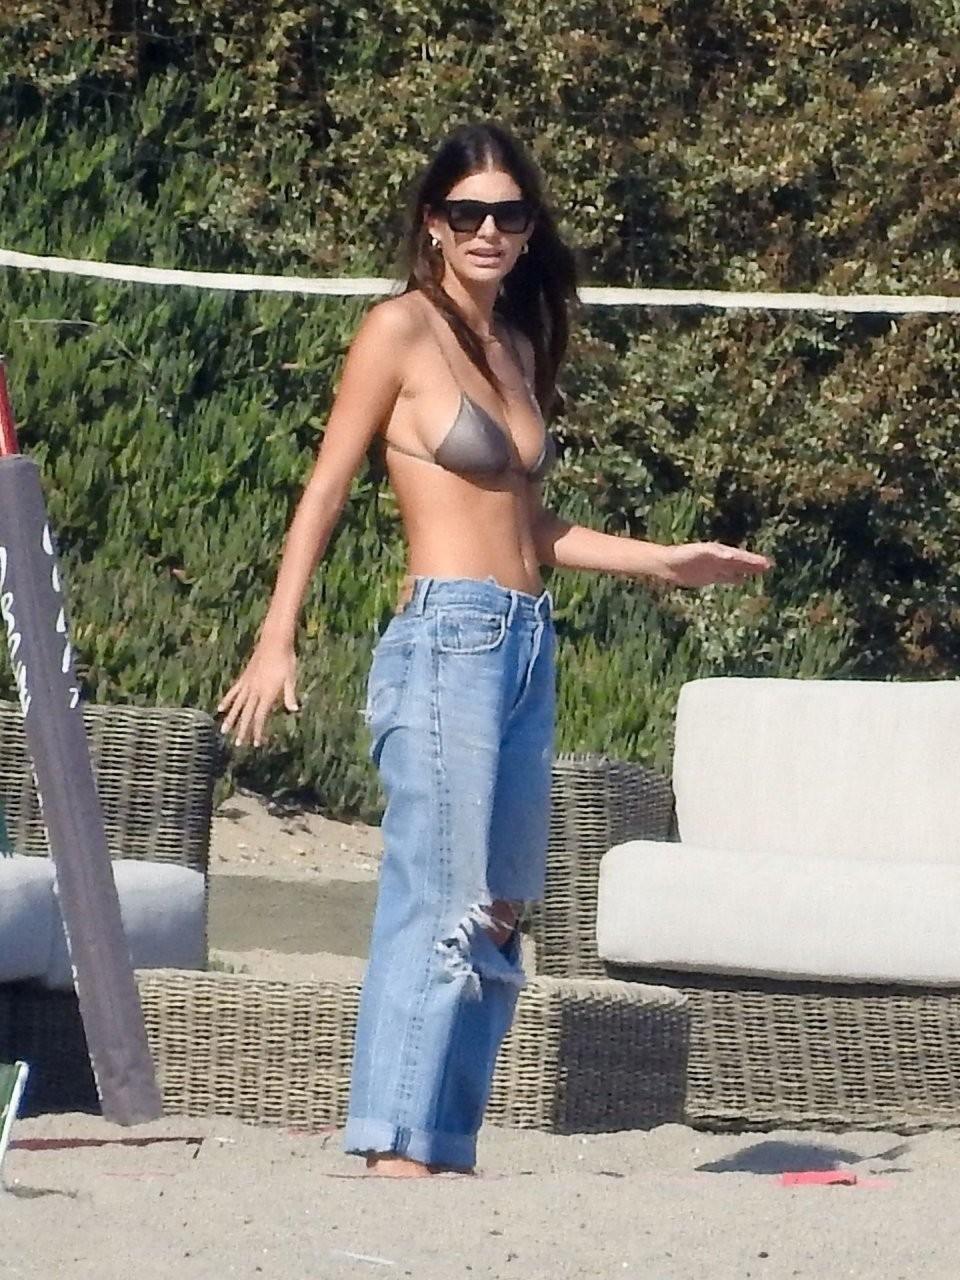 Nude camila morrone EXCLUSIVE: Camila